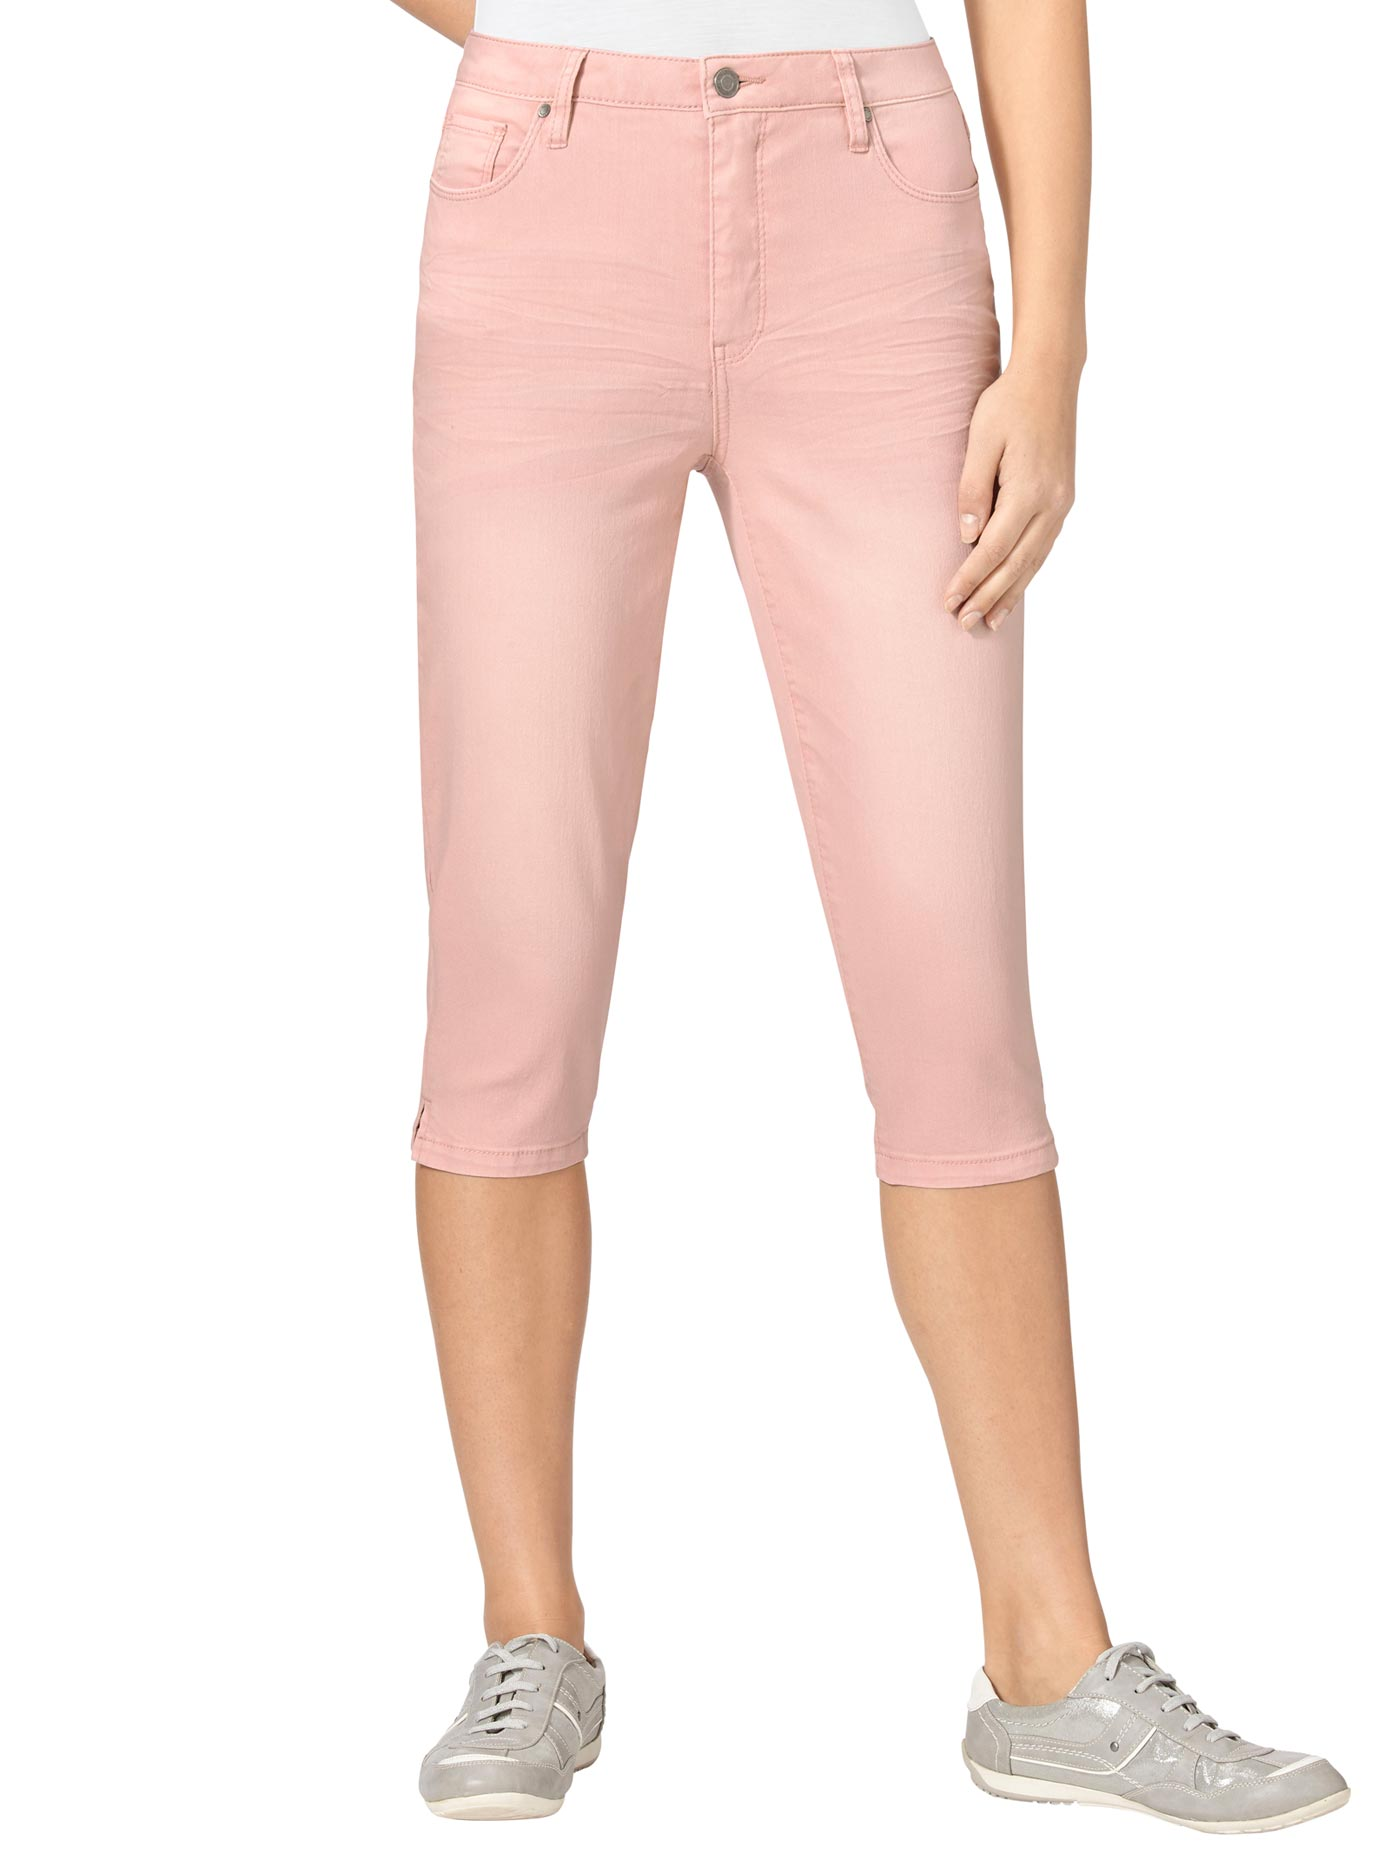 Casual Looks Capri-Jeans in 5-Pocket-Form | Bekleidung > Jeans > Caprijeans | Casual Looks